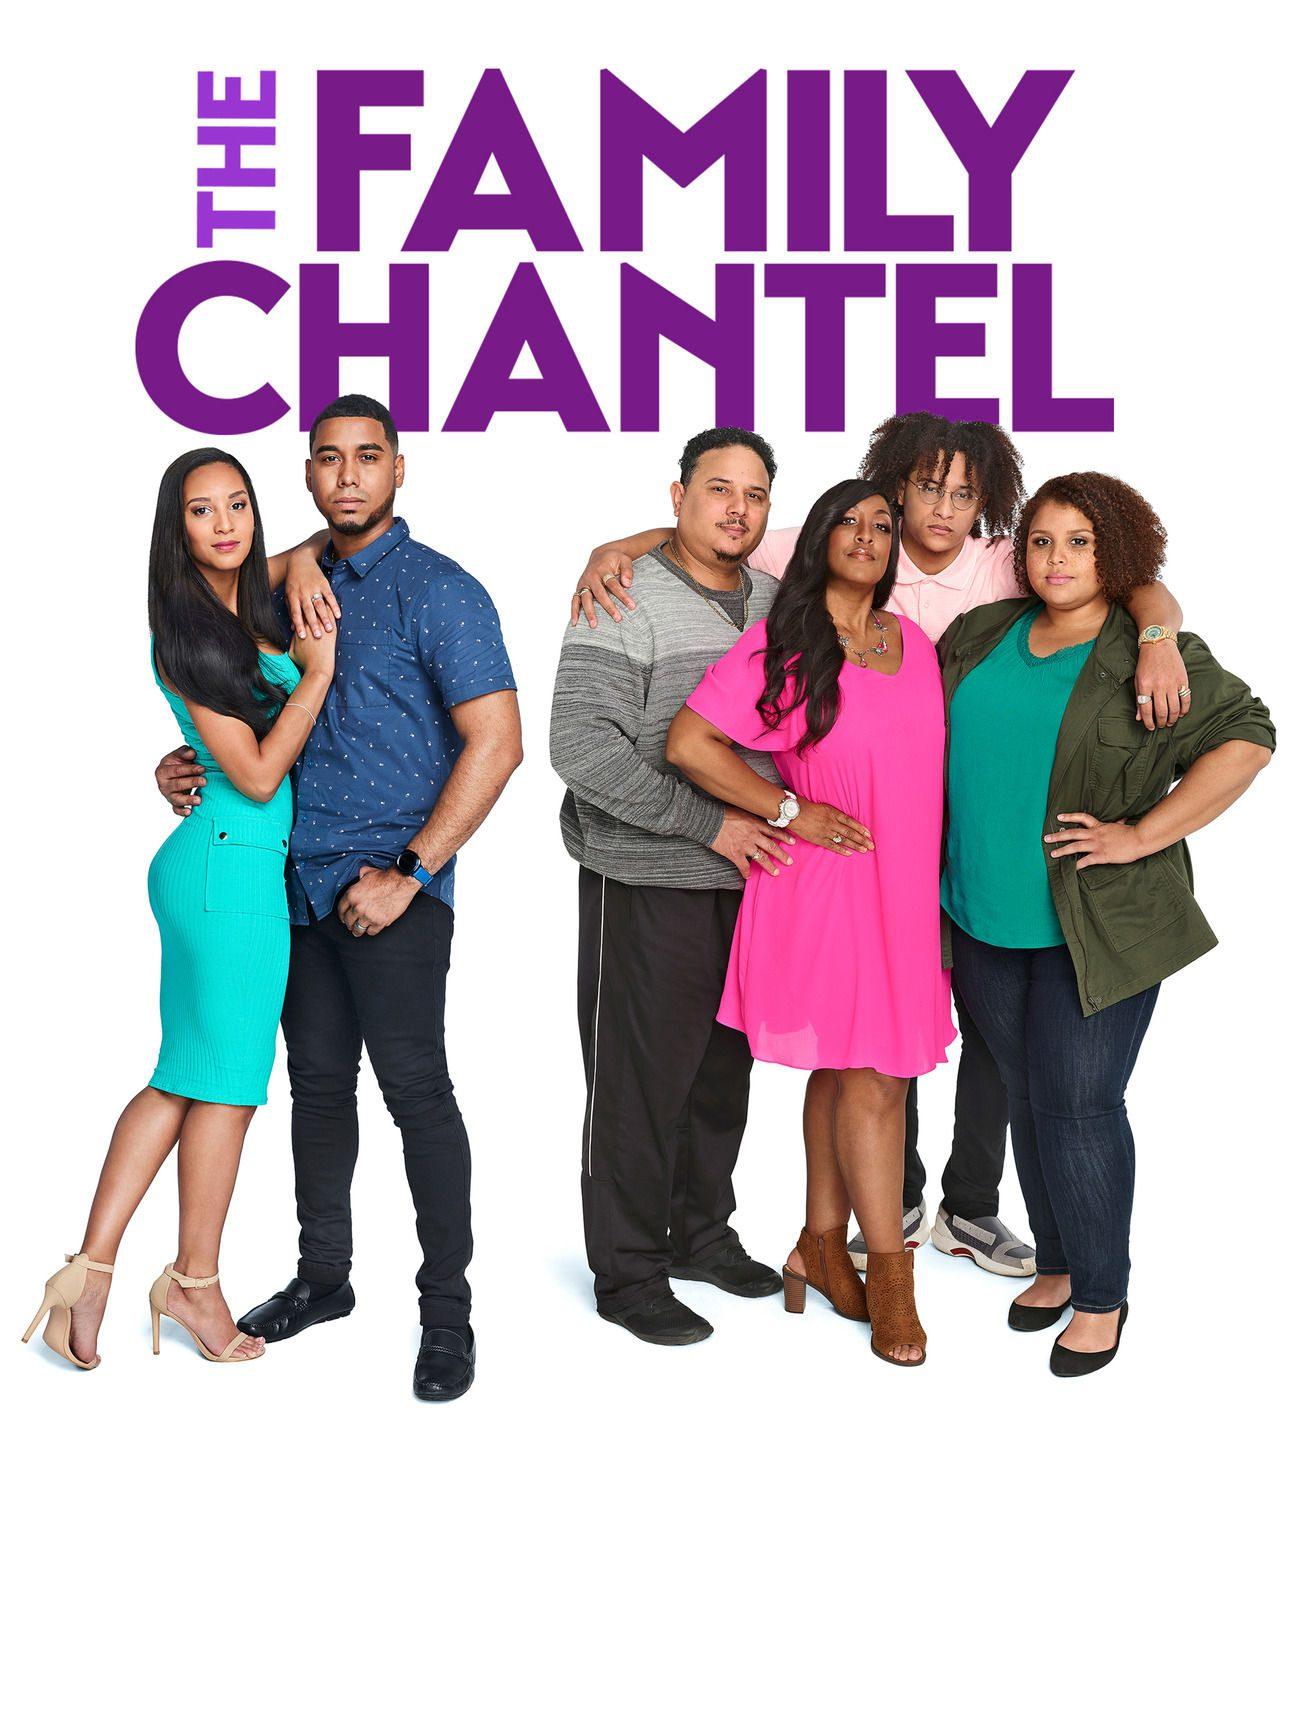 The Family Chantel teaser image